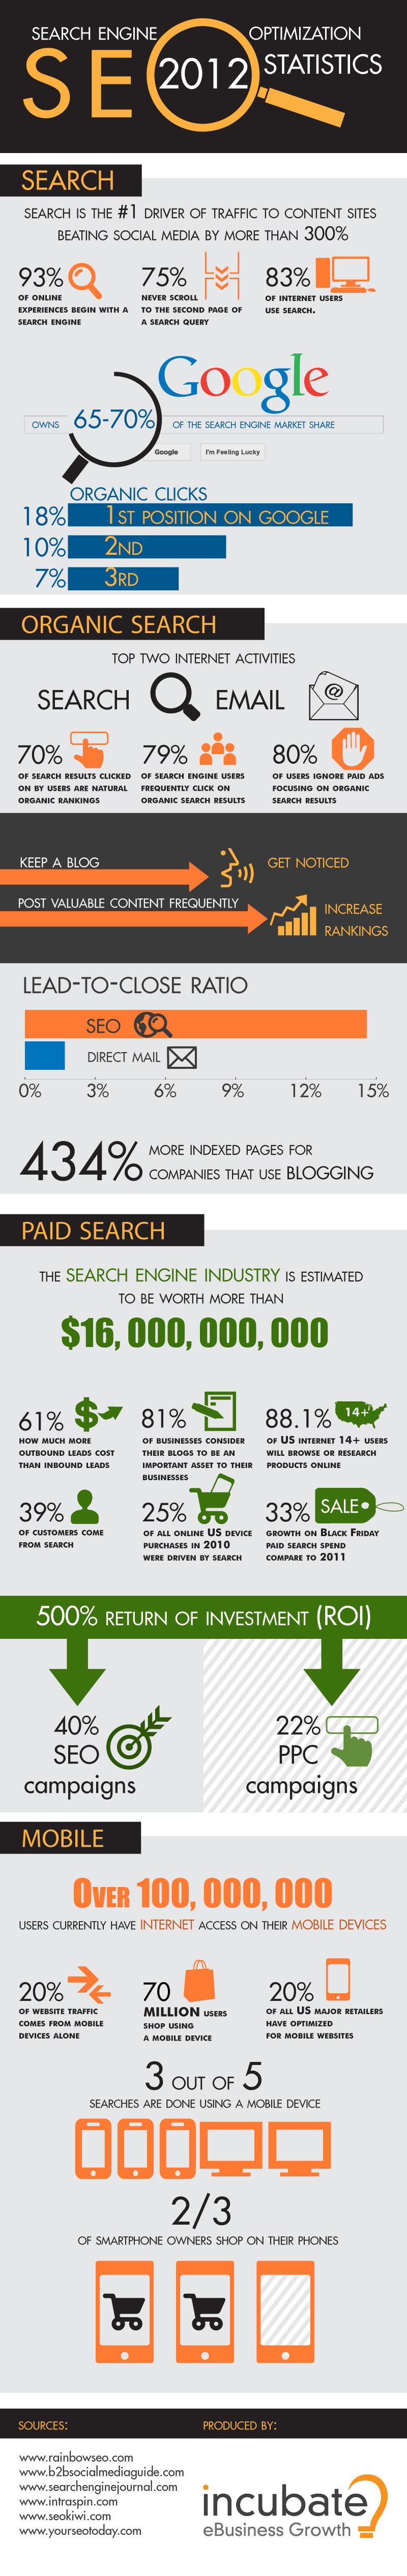 SEO-statistics-infographic